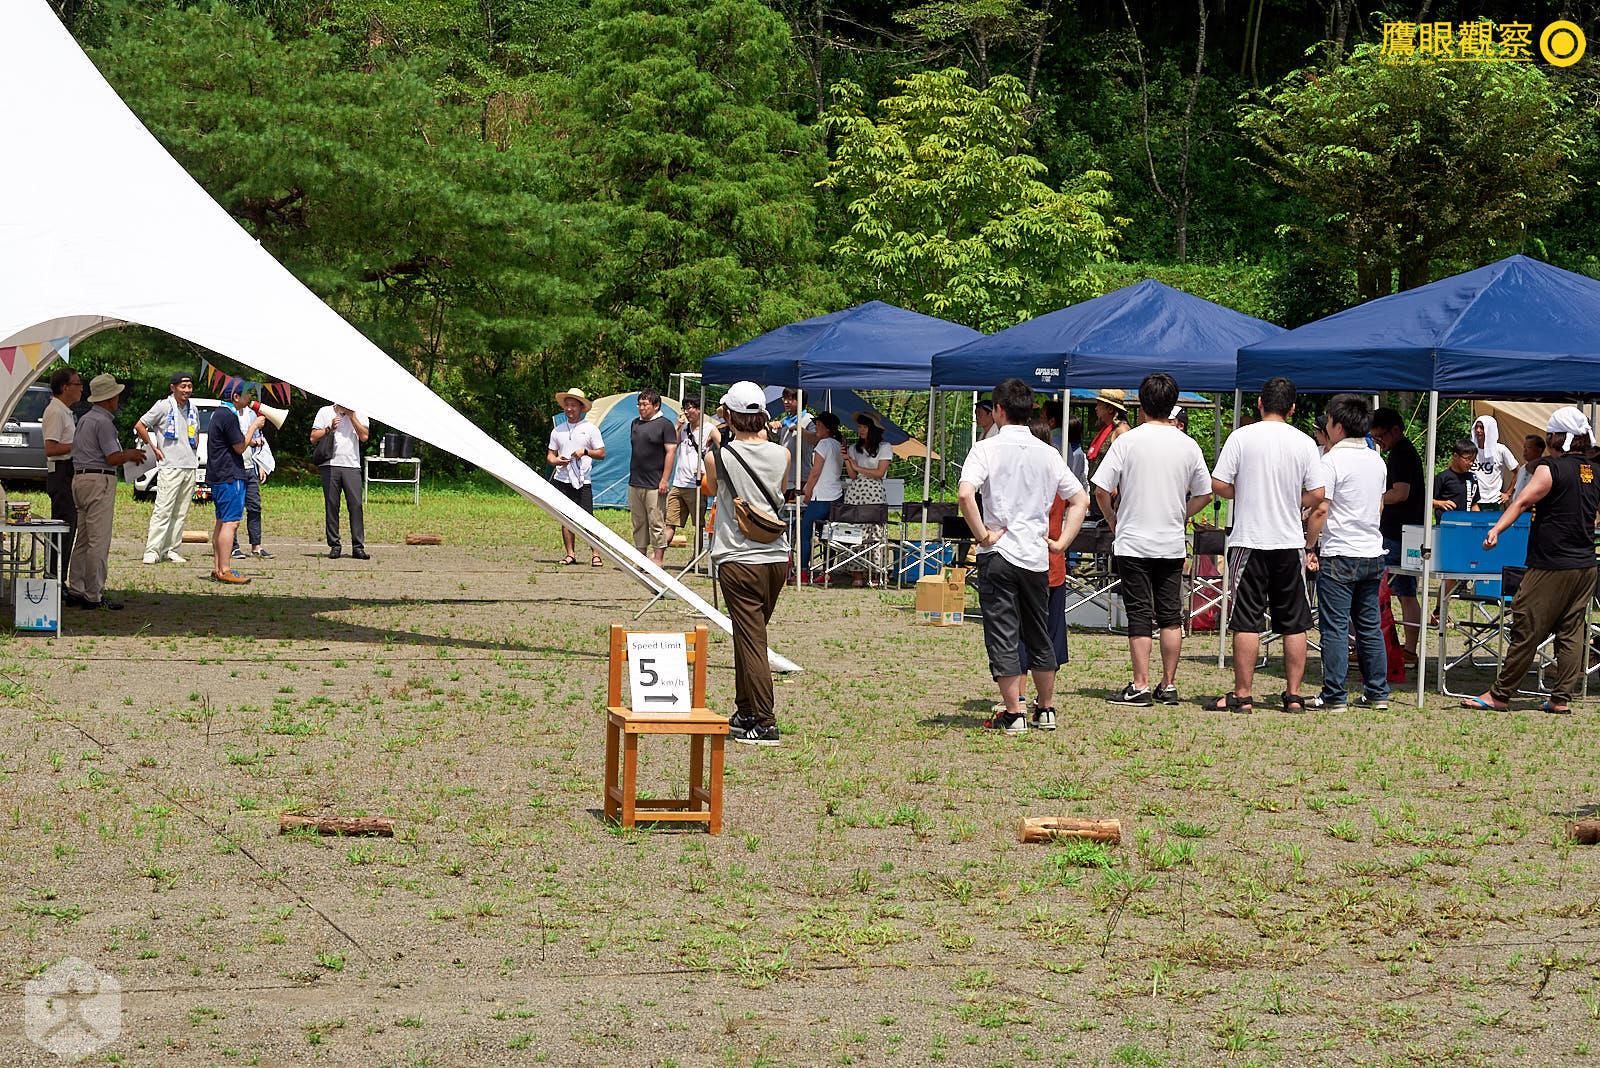 Japan Travel School BBQ 20190817112459 日本廢棄小學 🚗 RV 休旅車露營、森林探險之旅(櫪木縣鹿沼市立久我小學)🇯🇵⛺️